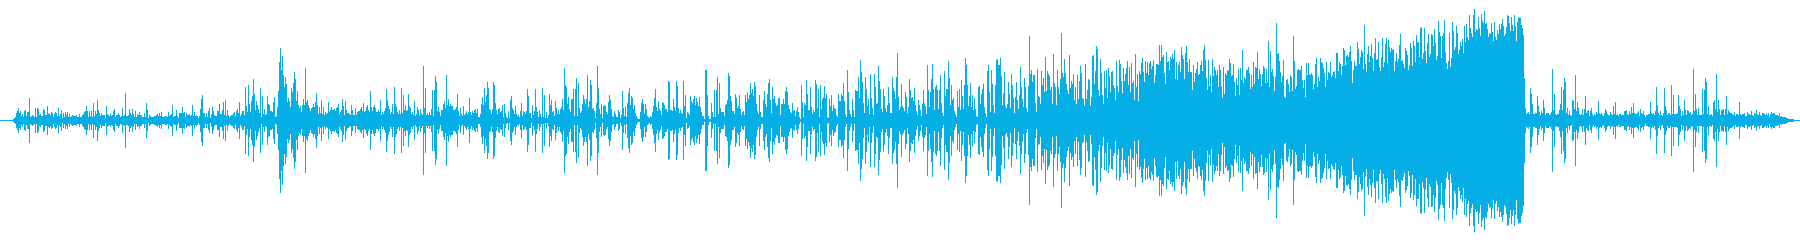 Intro (st-robo mix)の再生済みの波形